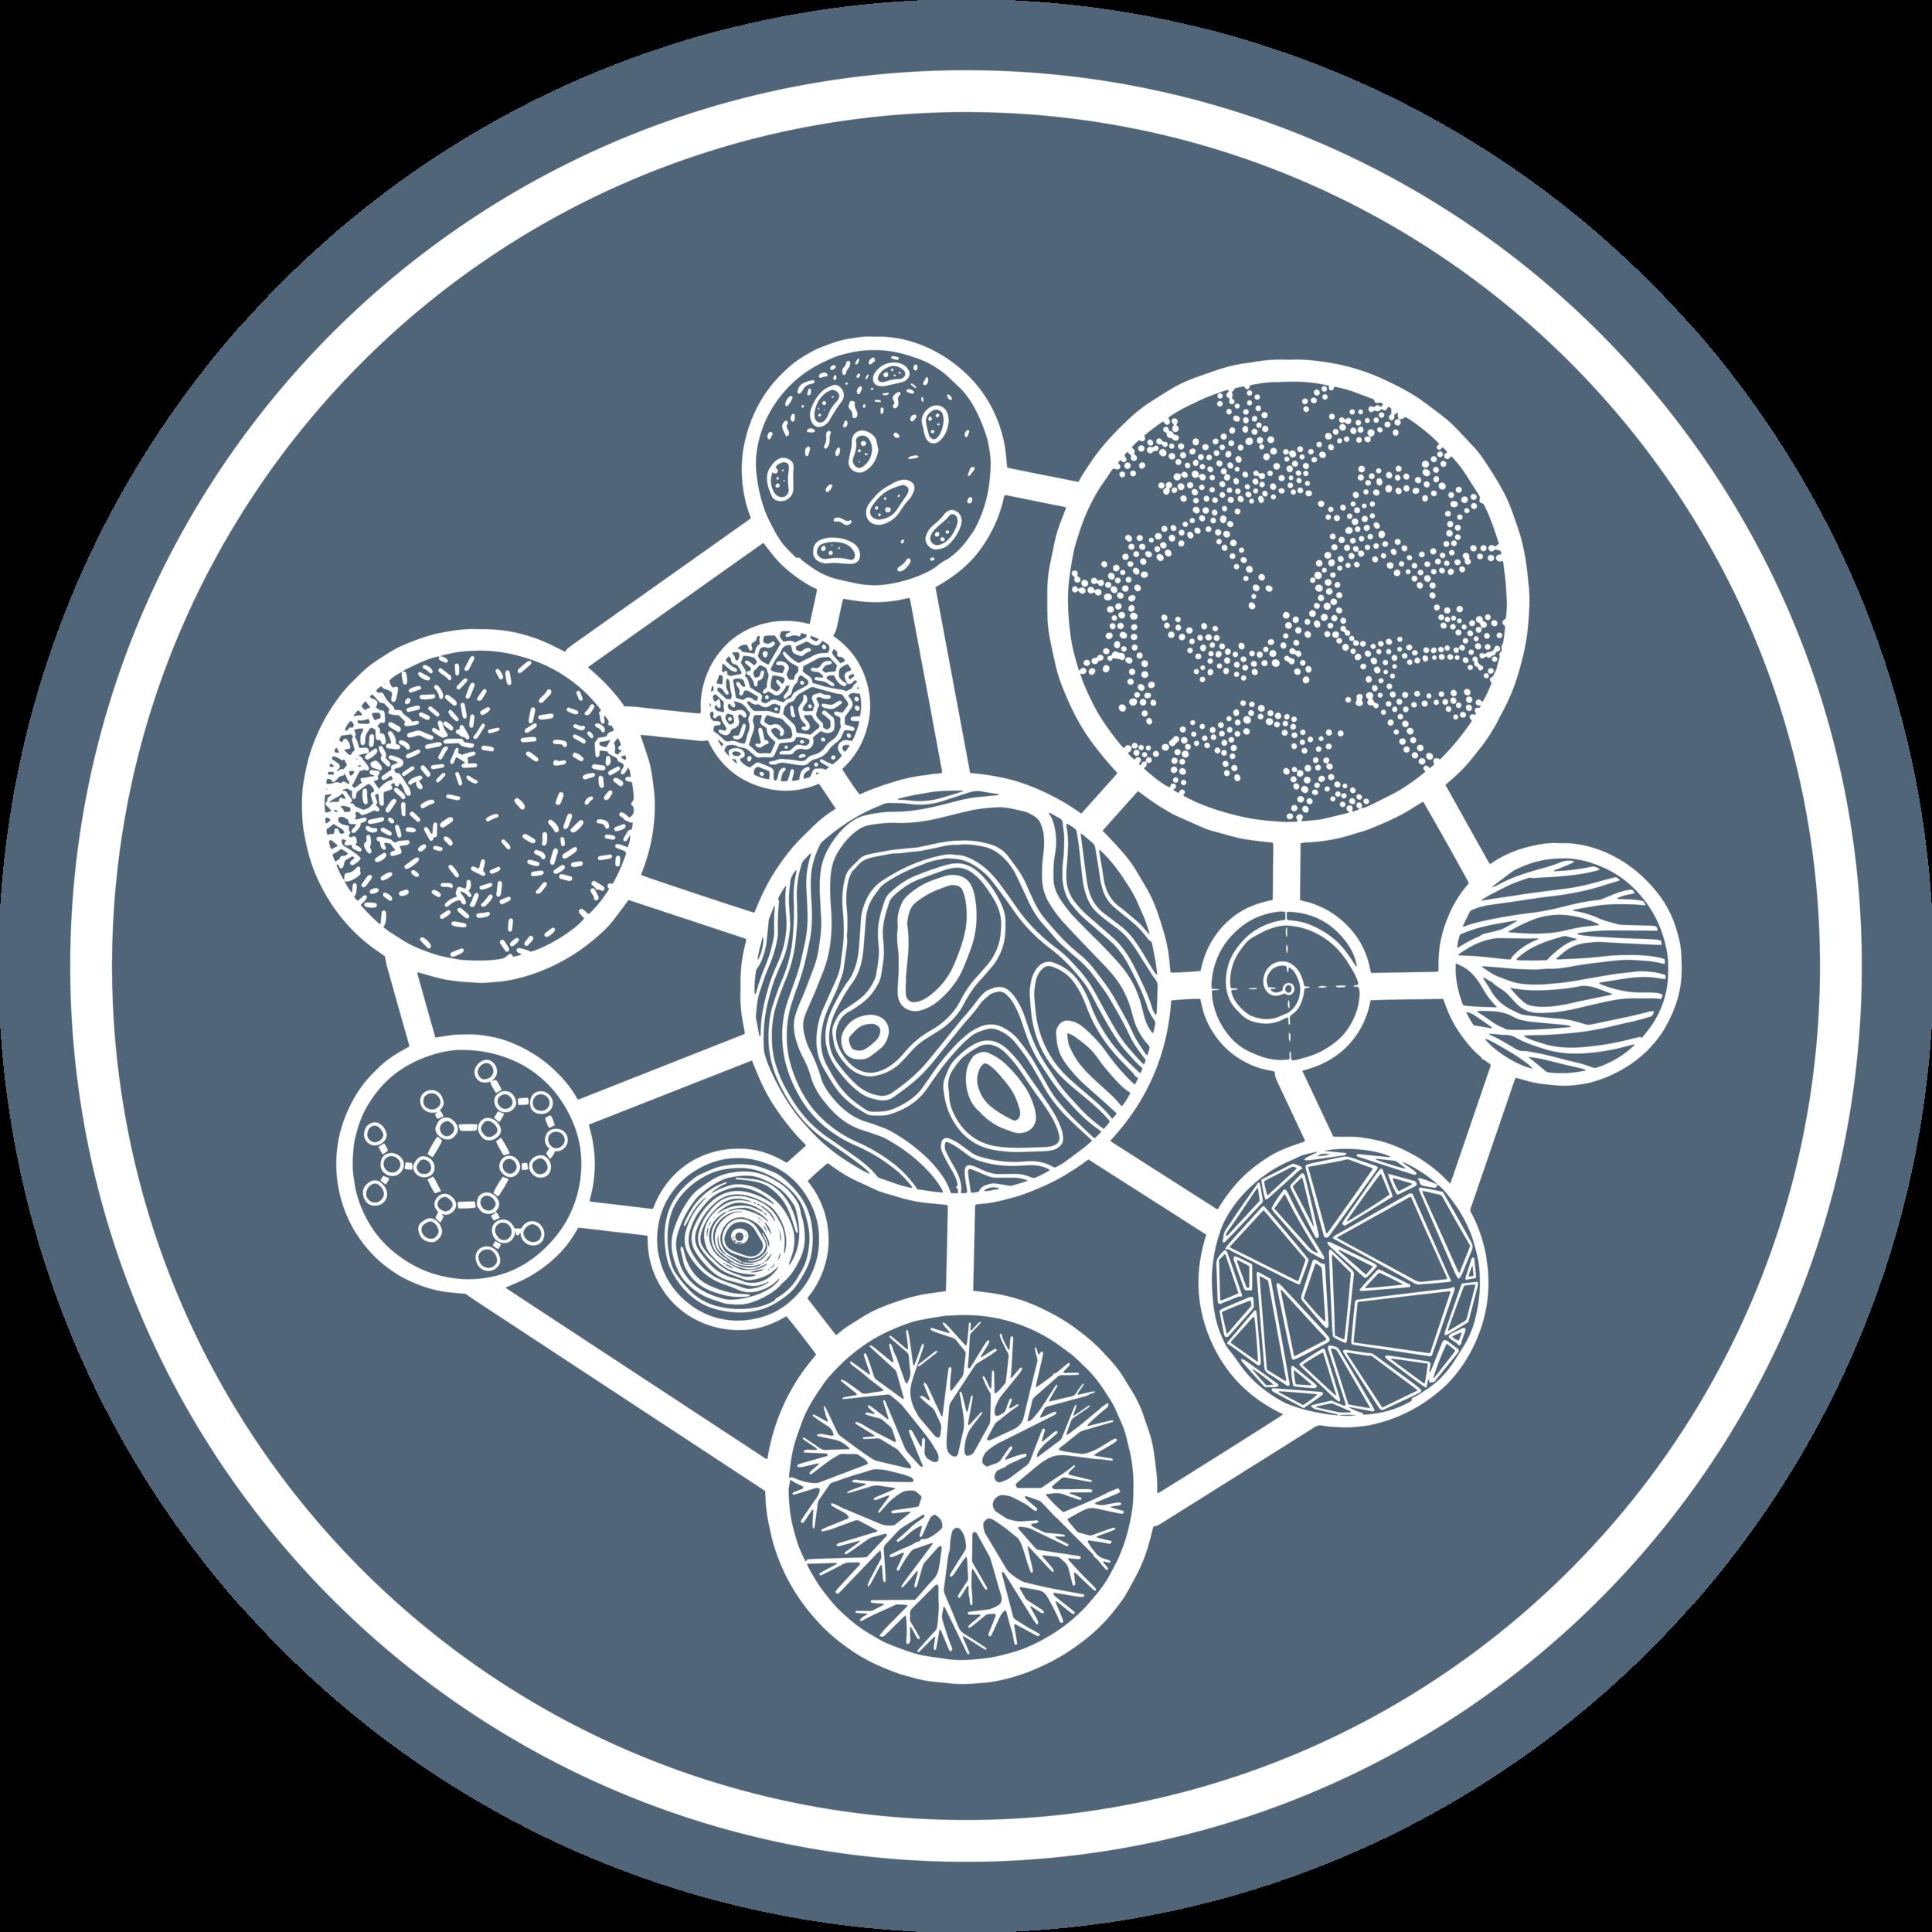 ScienceIconForNewsletter (1).png